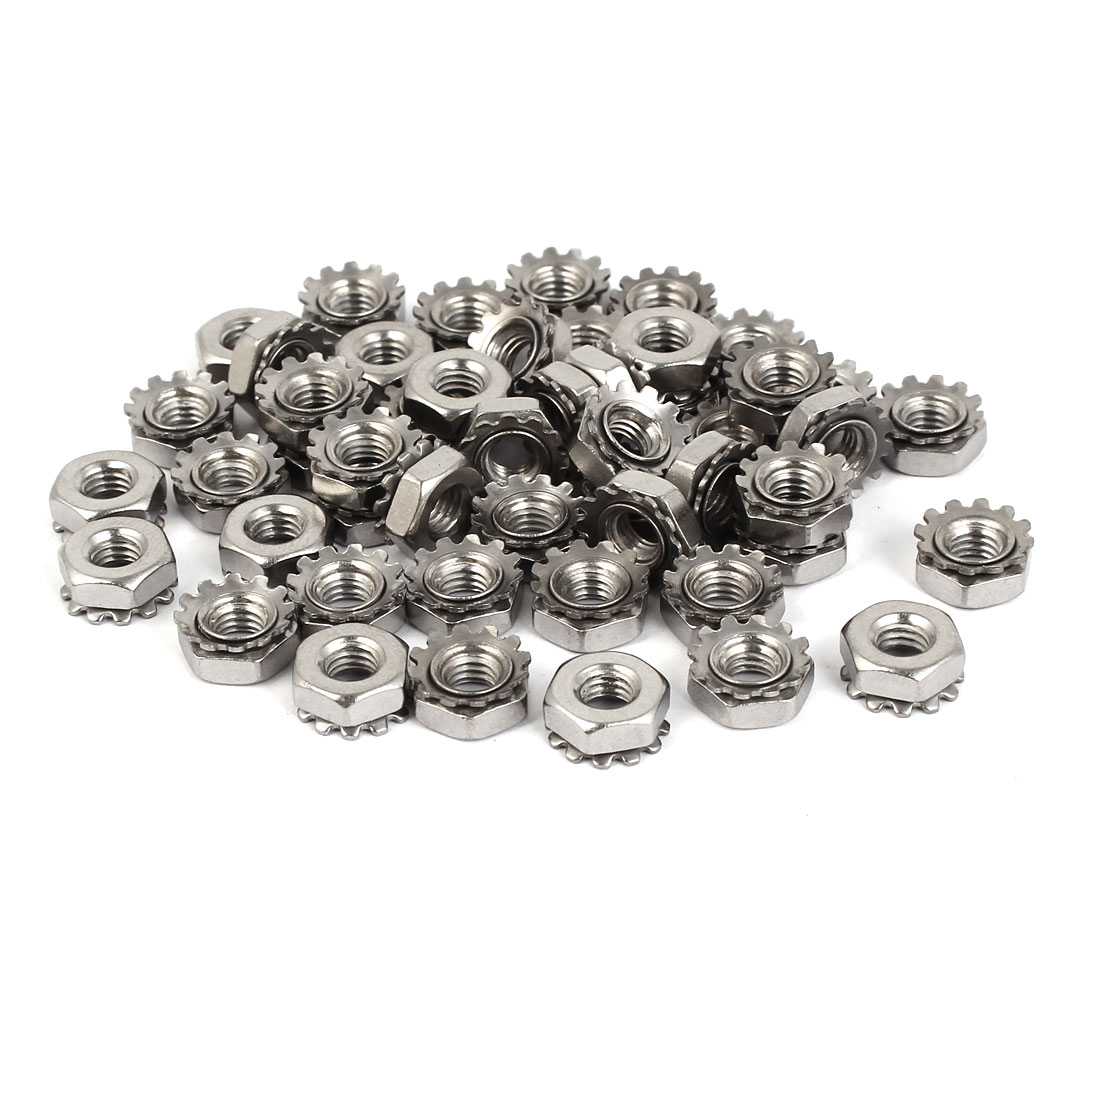 10#-32 Female Thread Zinc Plated Kep Hex Head Lock Nut 50pcs